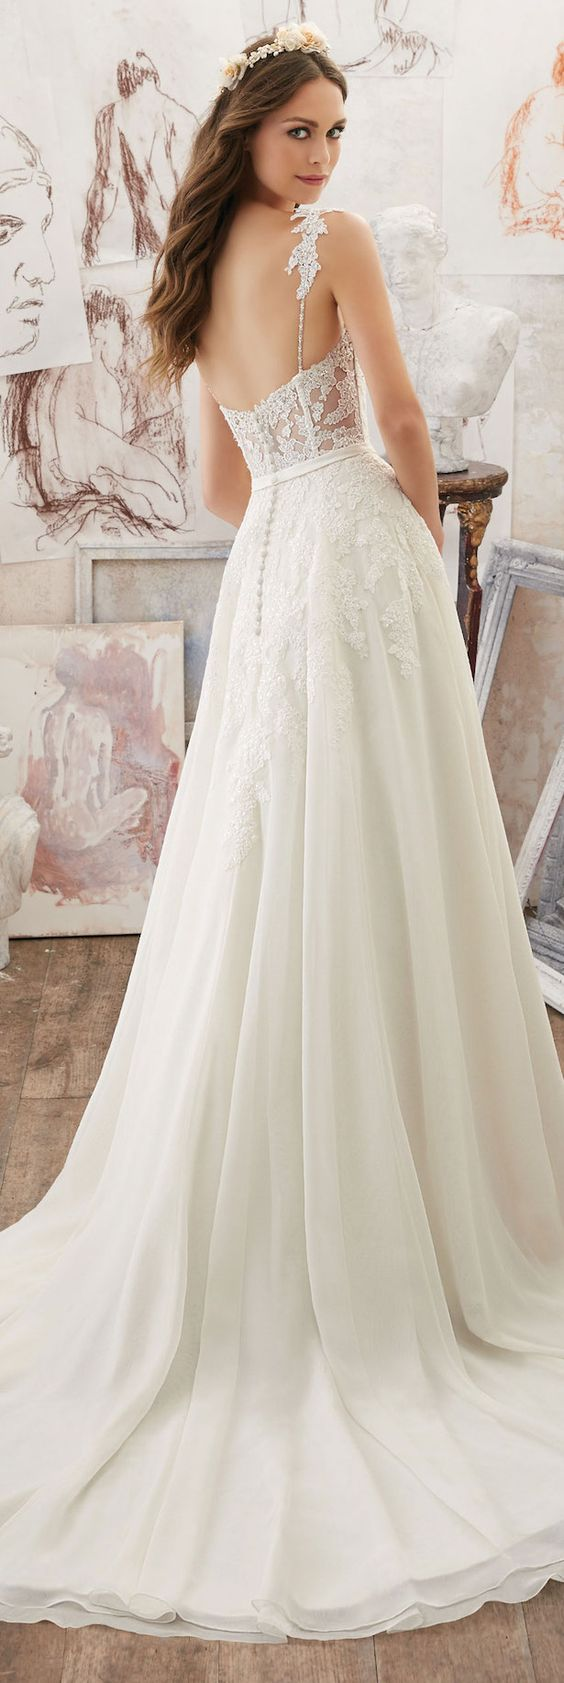 Mori Lee by Madeline Gardner Romantic Wedding Dress